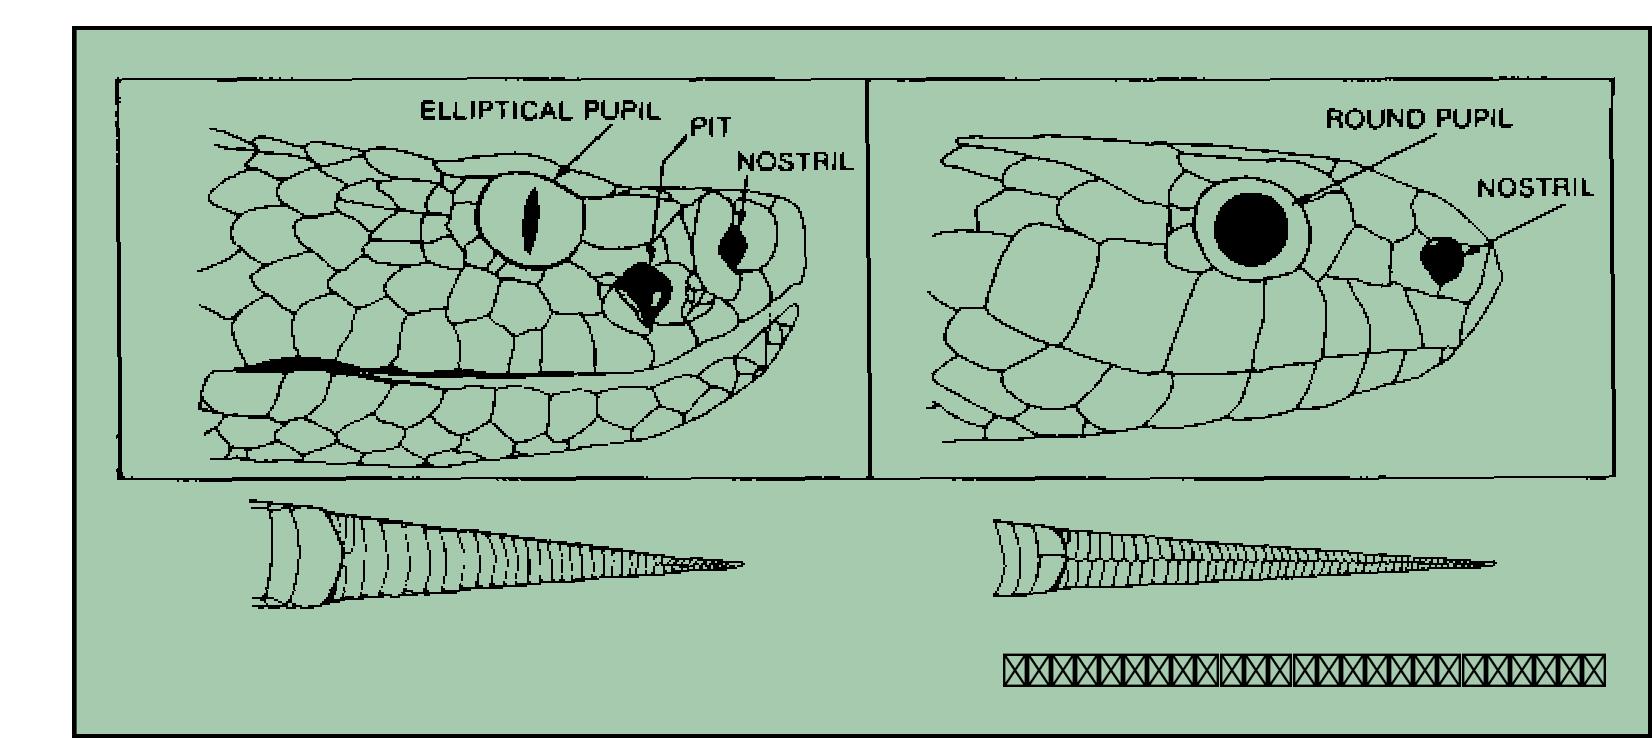 MDWFP - Venomous Snakes of Mississippi